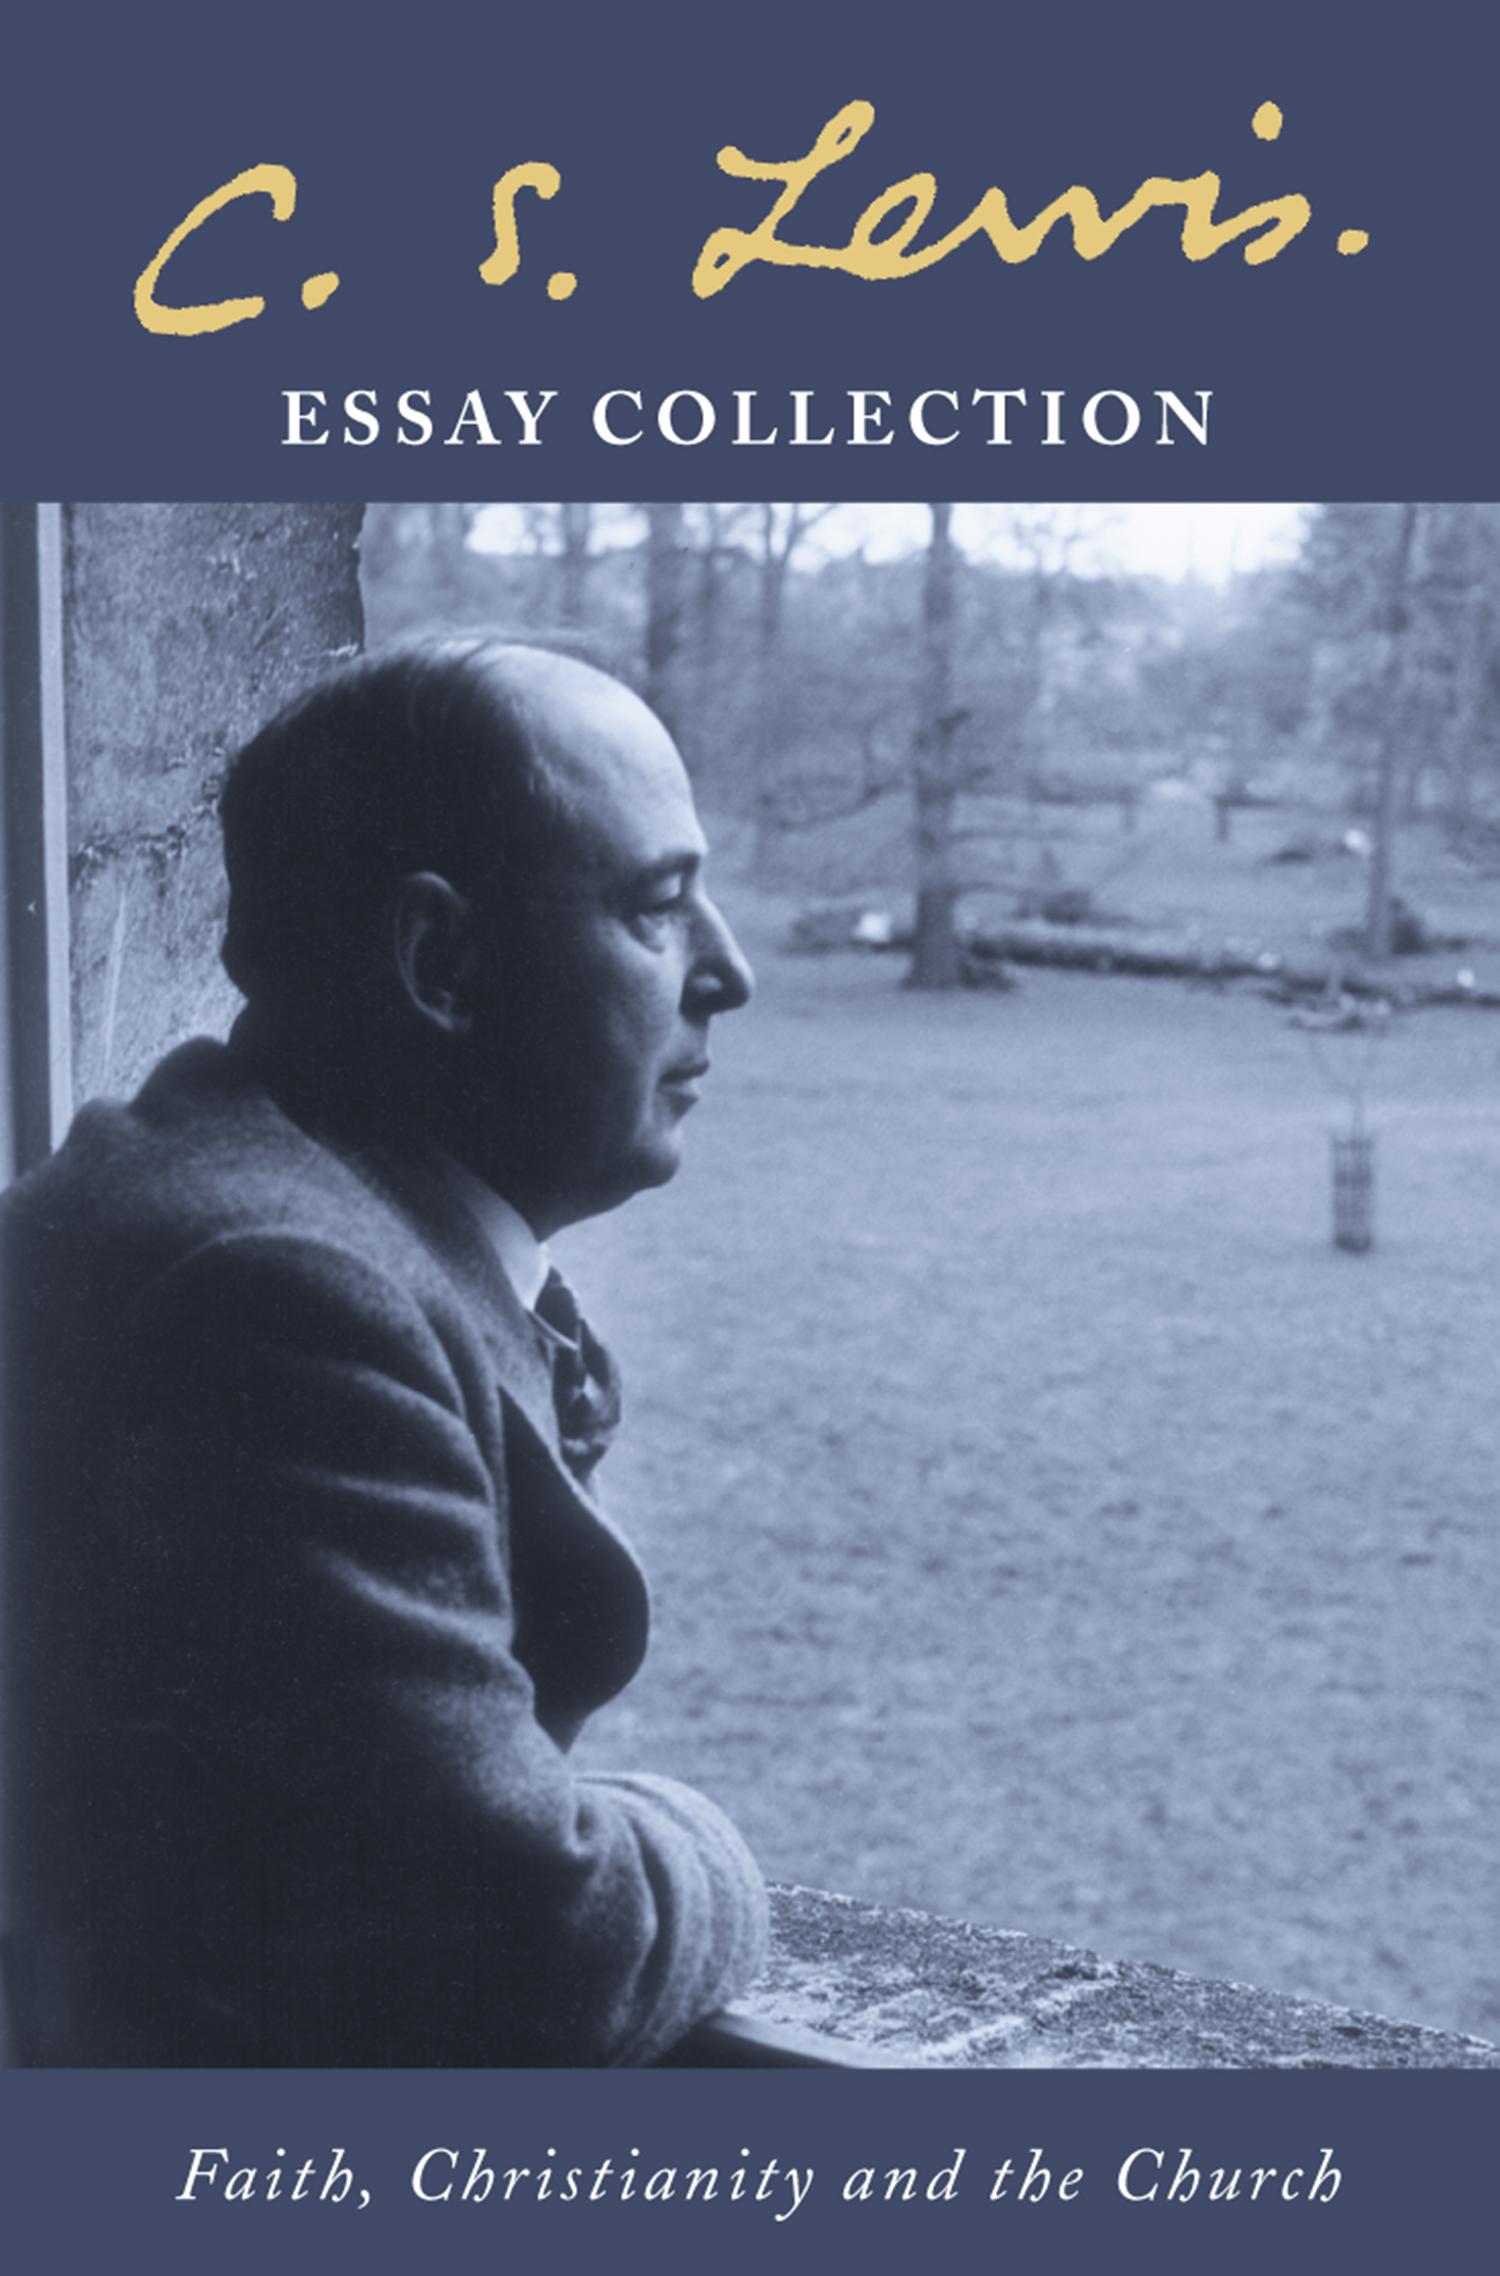 essays in honor of allan bloom